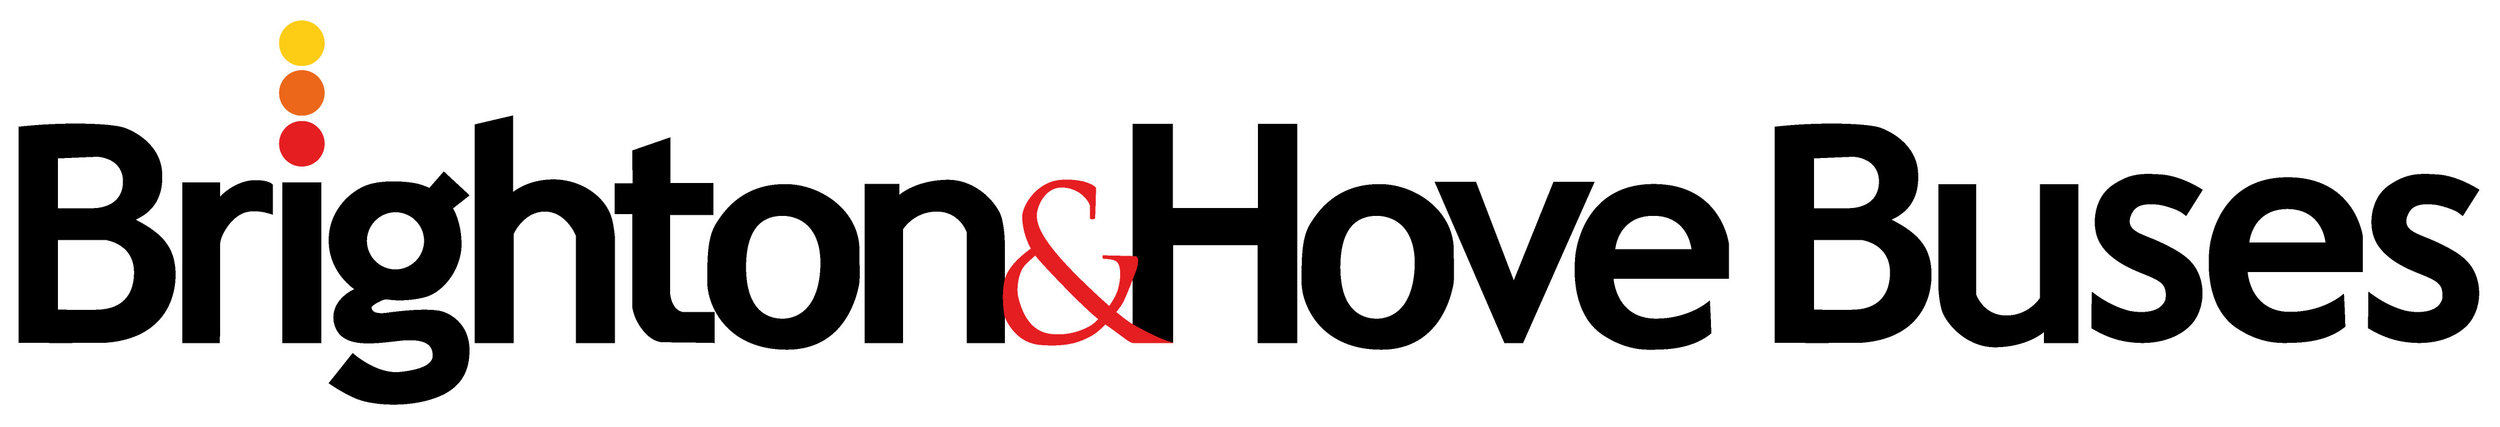 B&H-Buses-Logo-Colour-JPEG (1).JPG